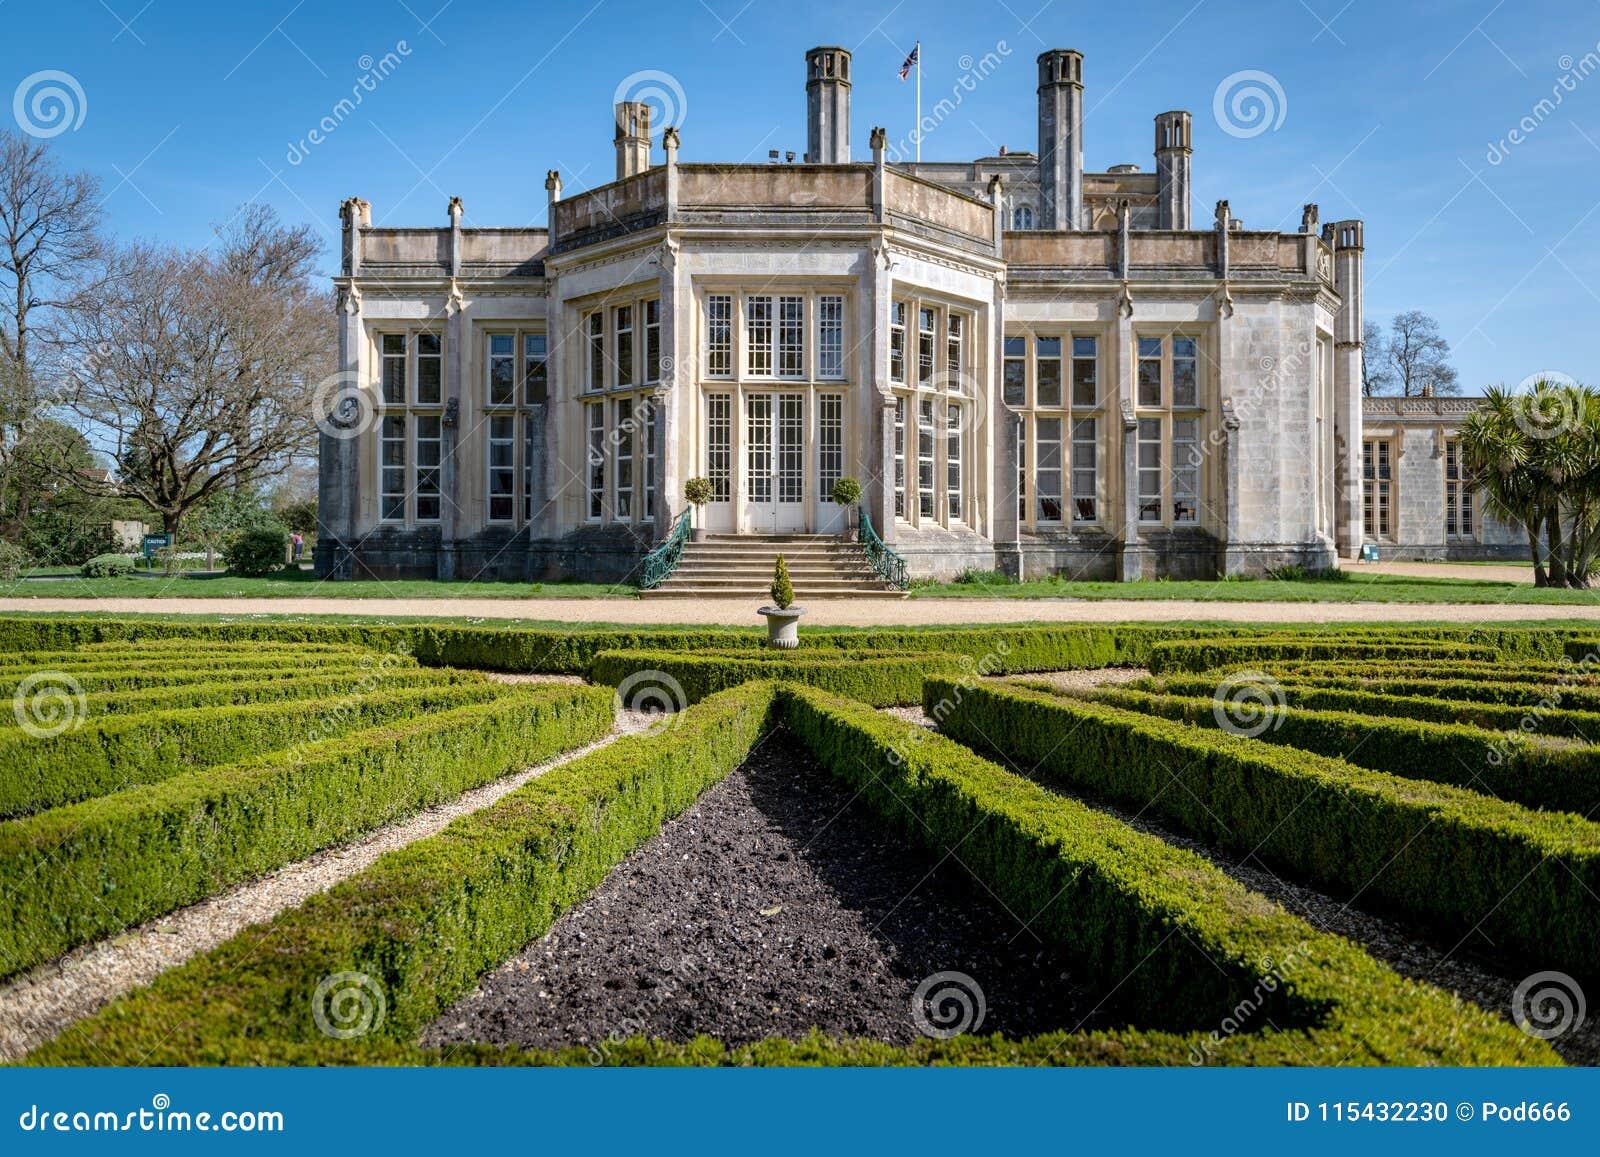 Obra-prima romântica do castelo de Highcliffe